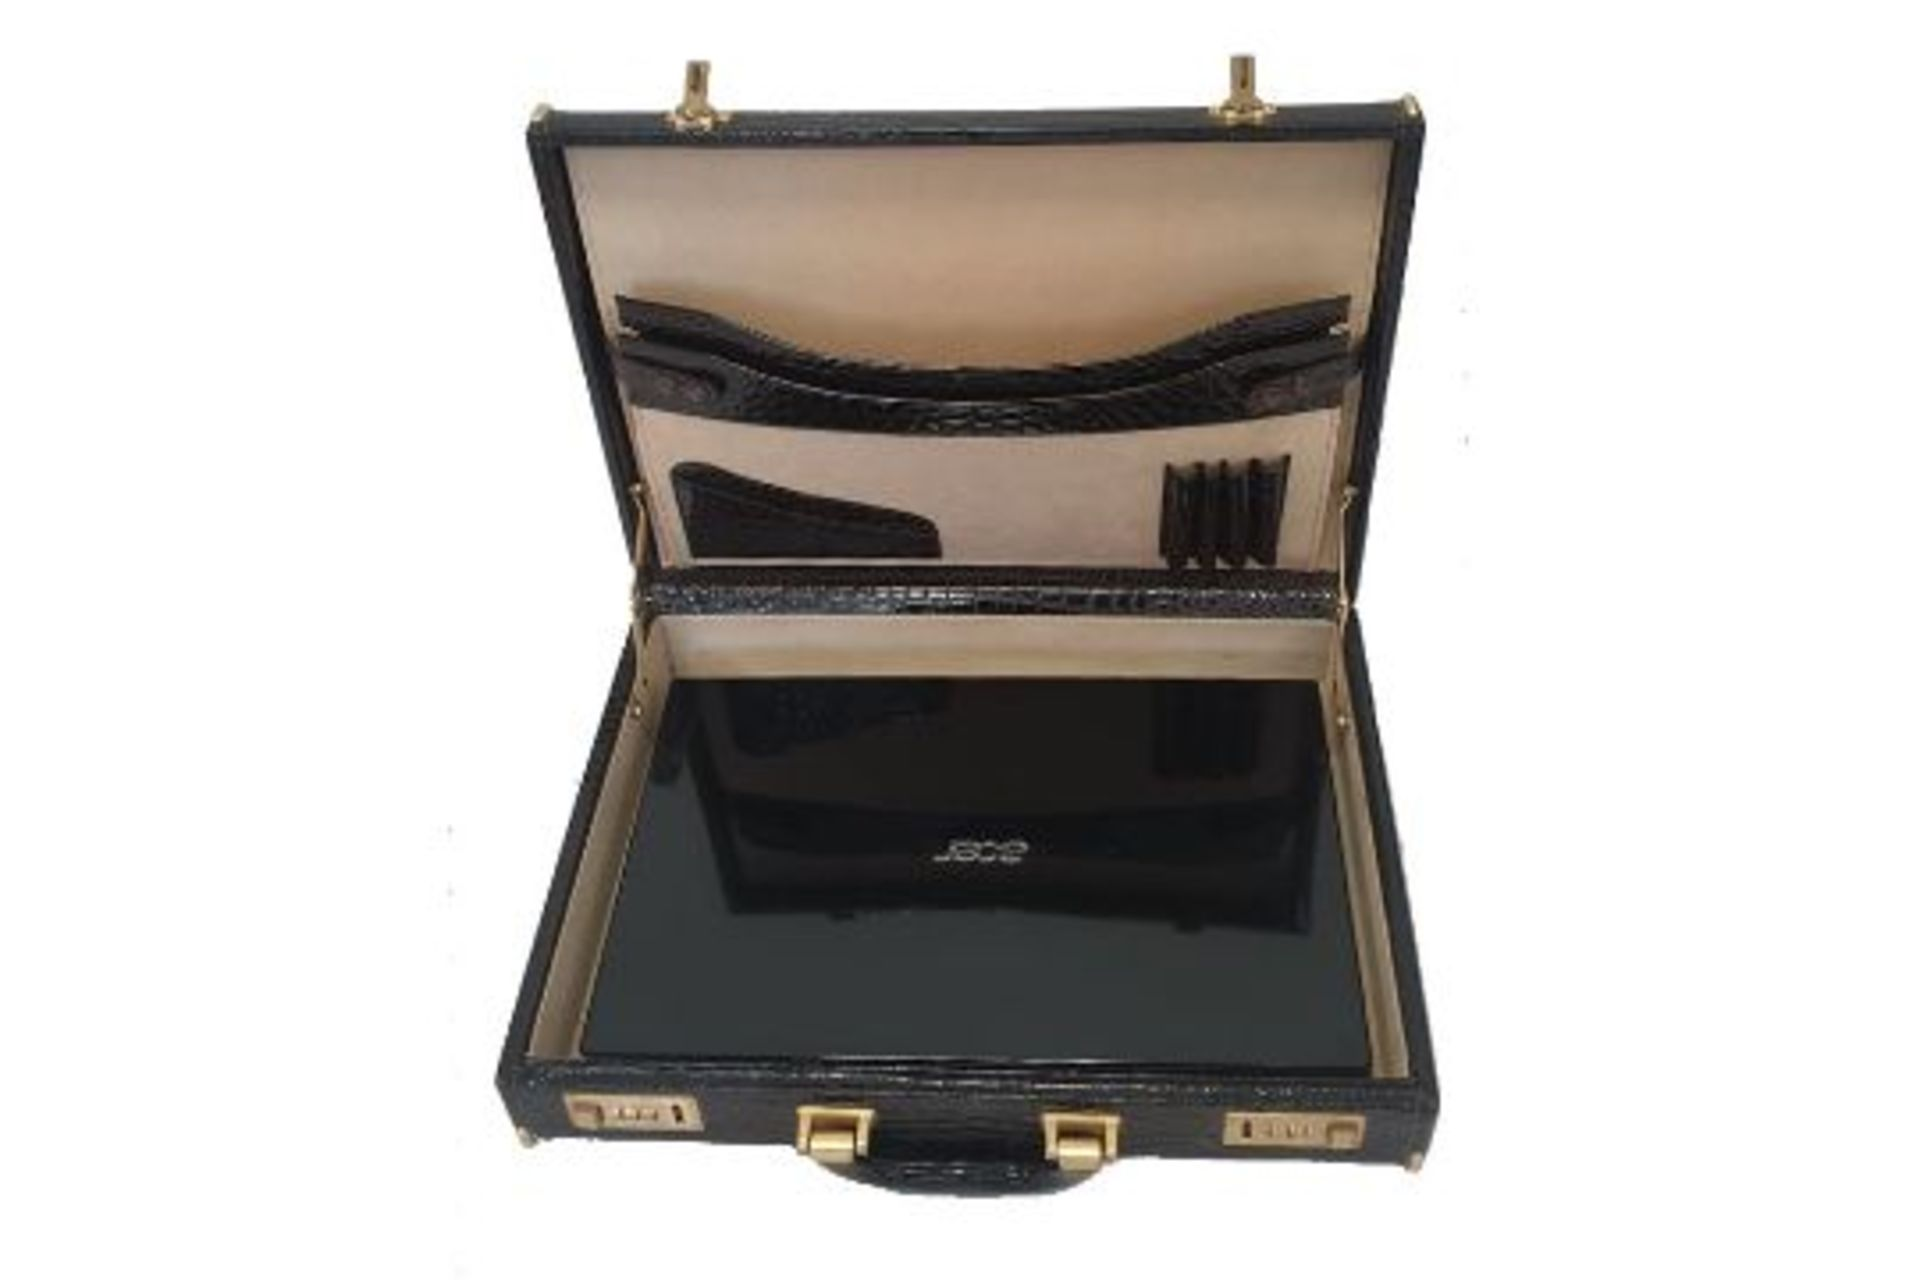 Crocodile Leather   Briefcase - Image 5 of 5